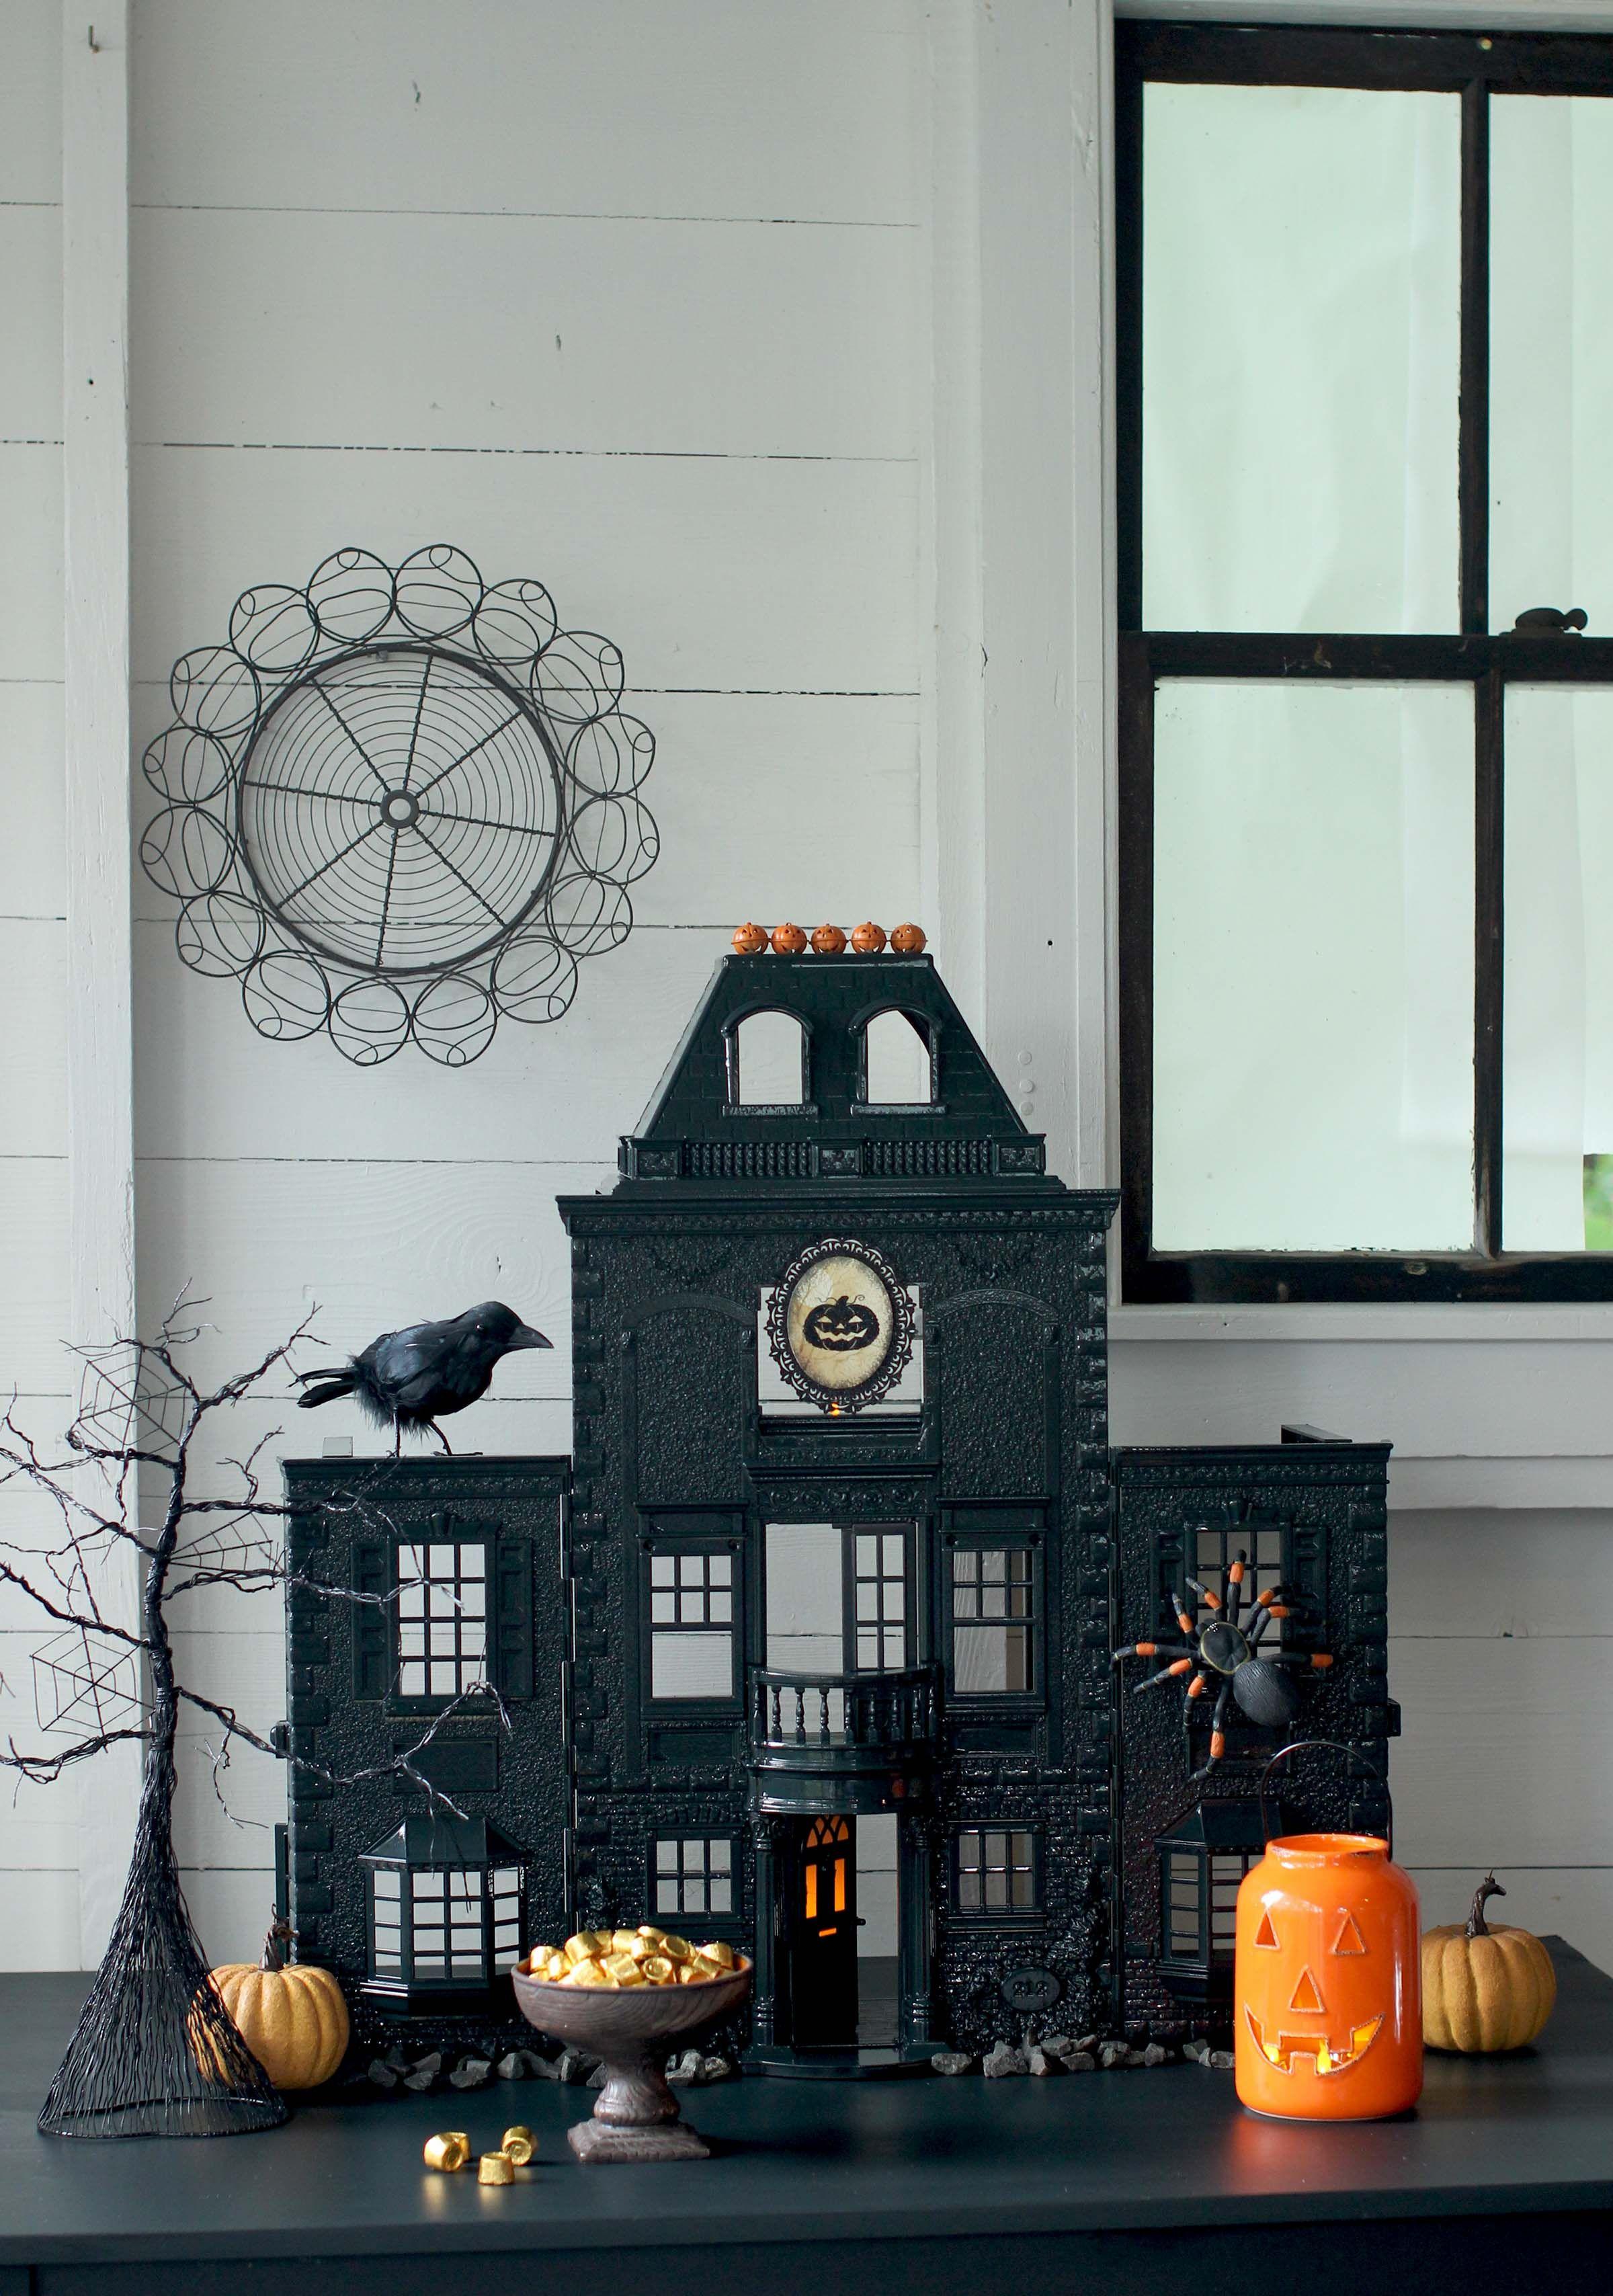 spooktacular halloween decor ideas #halloween #diy   home accents +